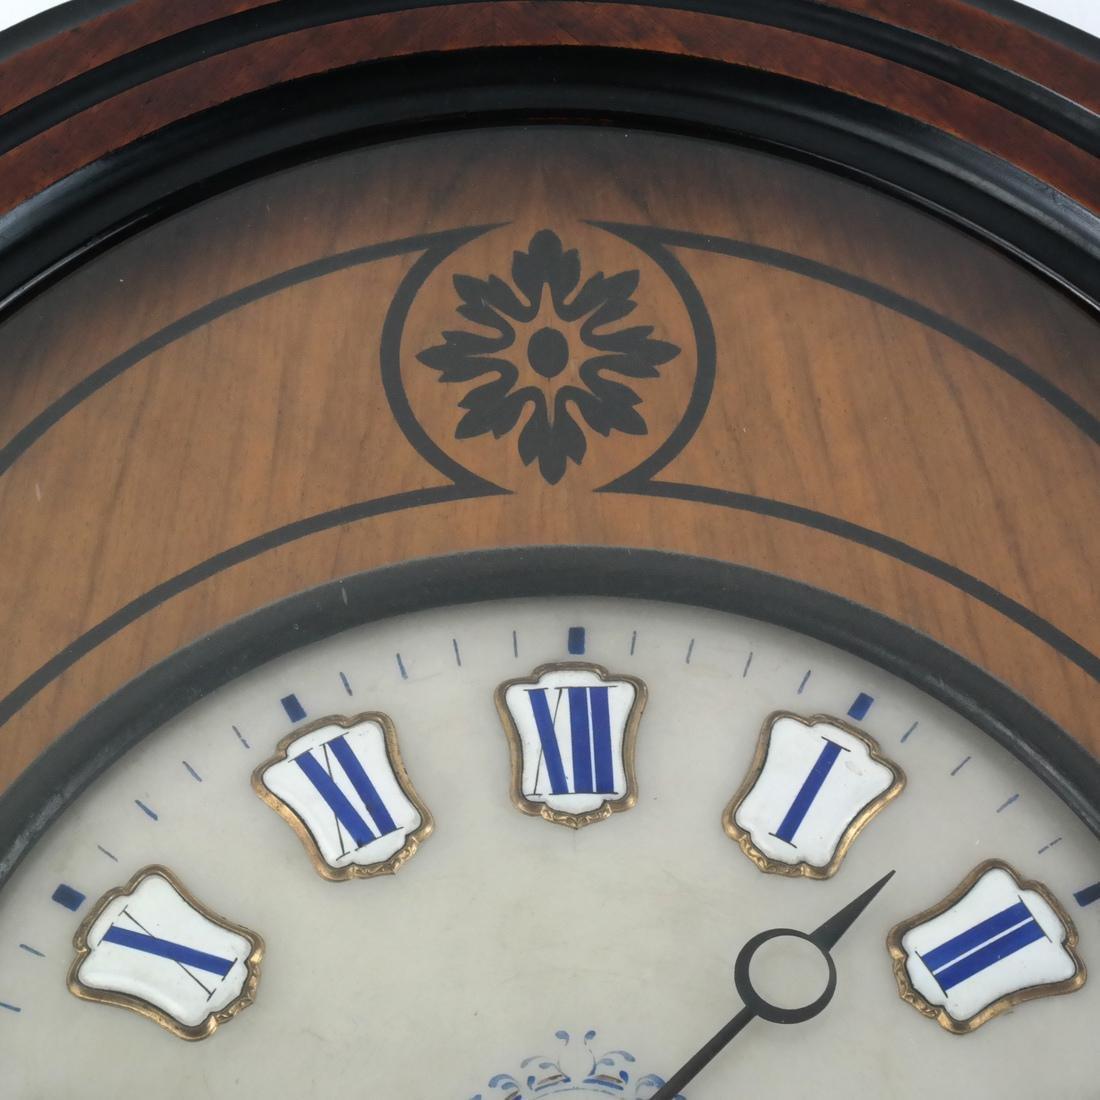 Biedermeier-Style Oval Regulator Clock - 3